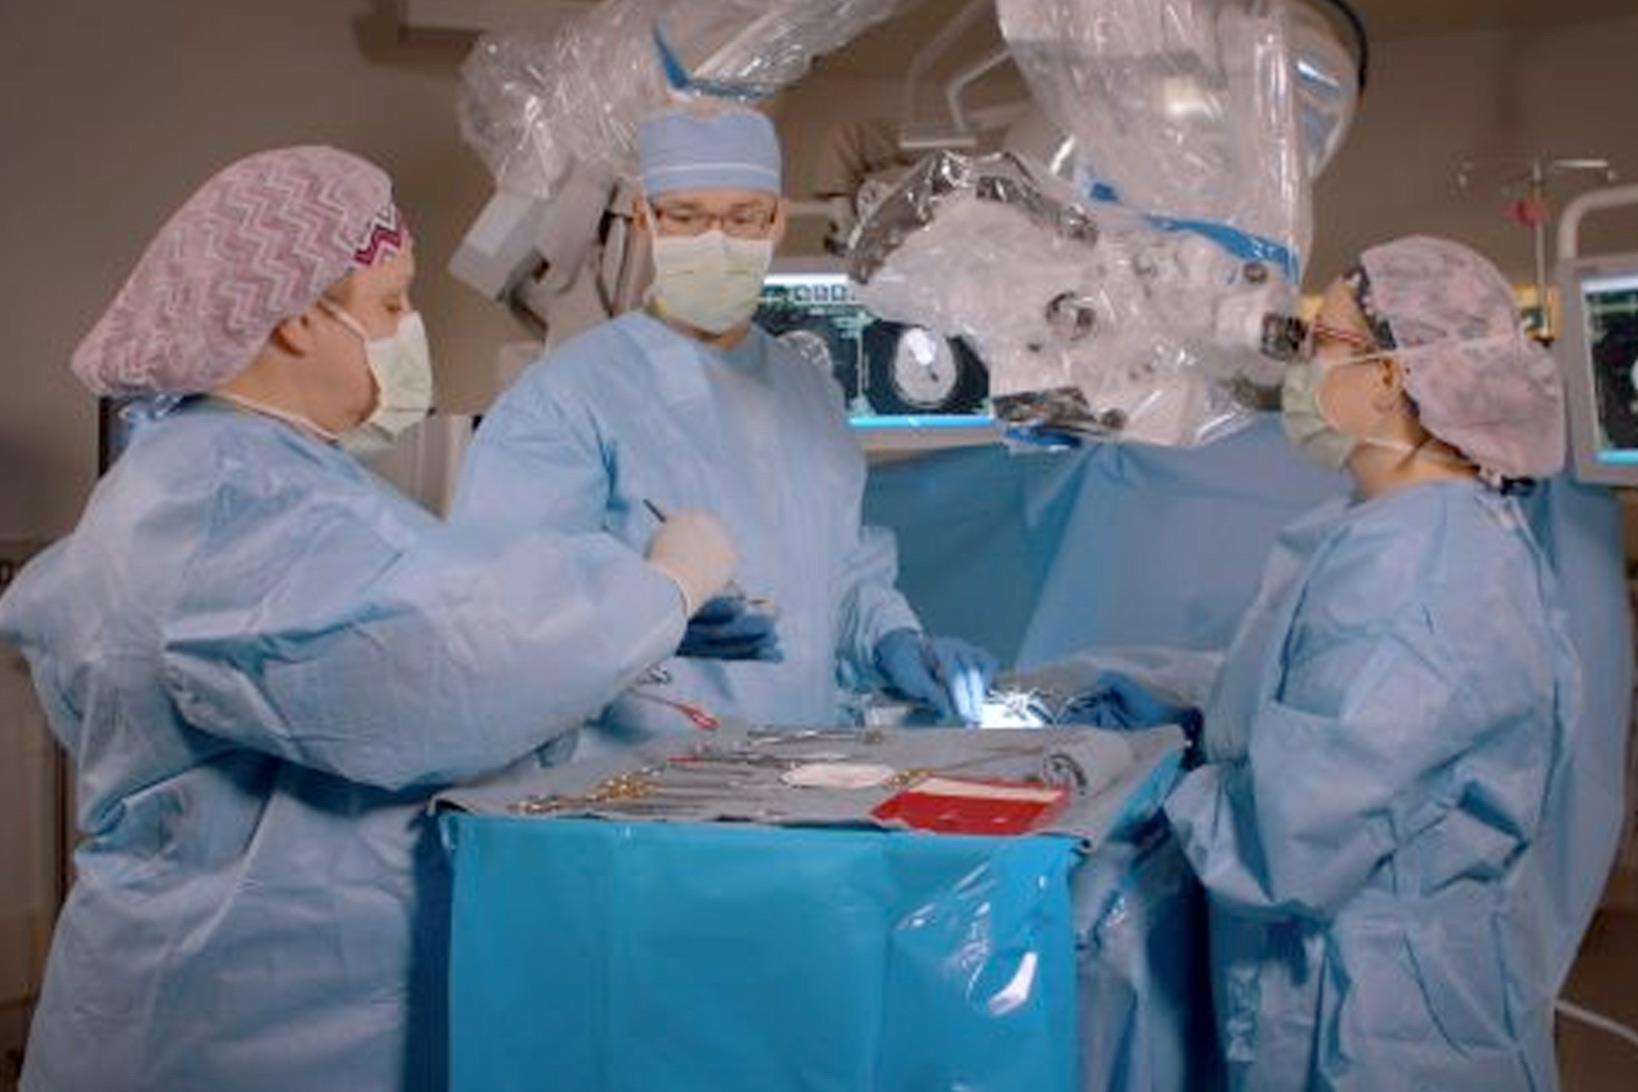 Awake craniotomy at Lexington Medical Center